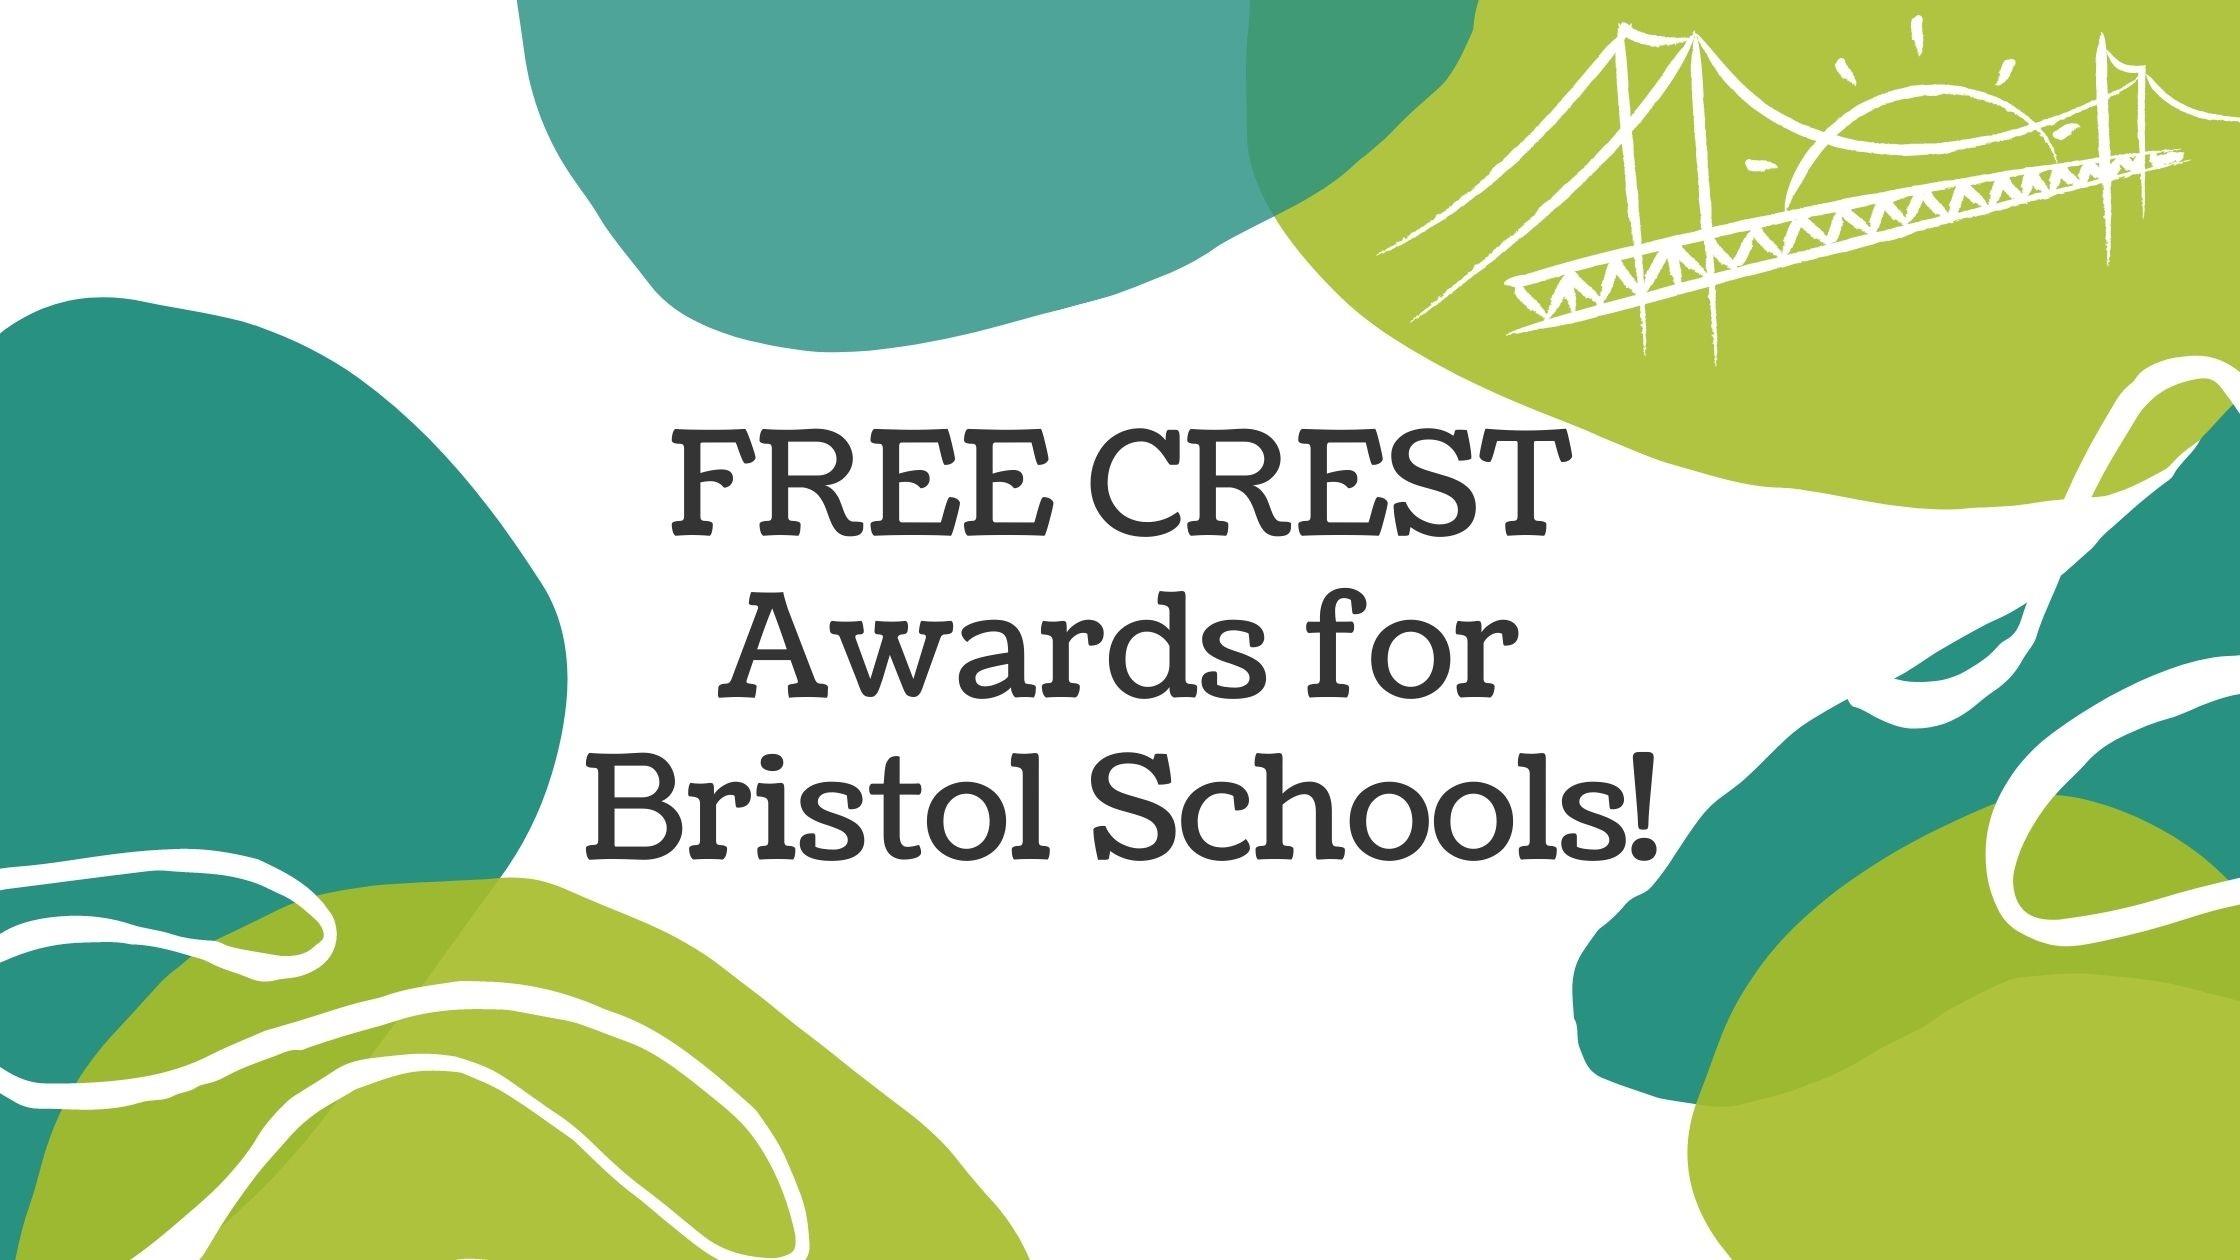 FREE CREST Awards for Bristol Schools